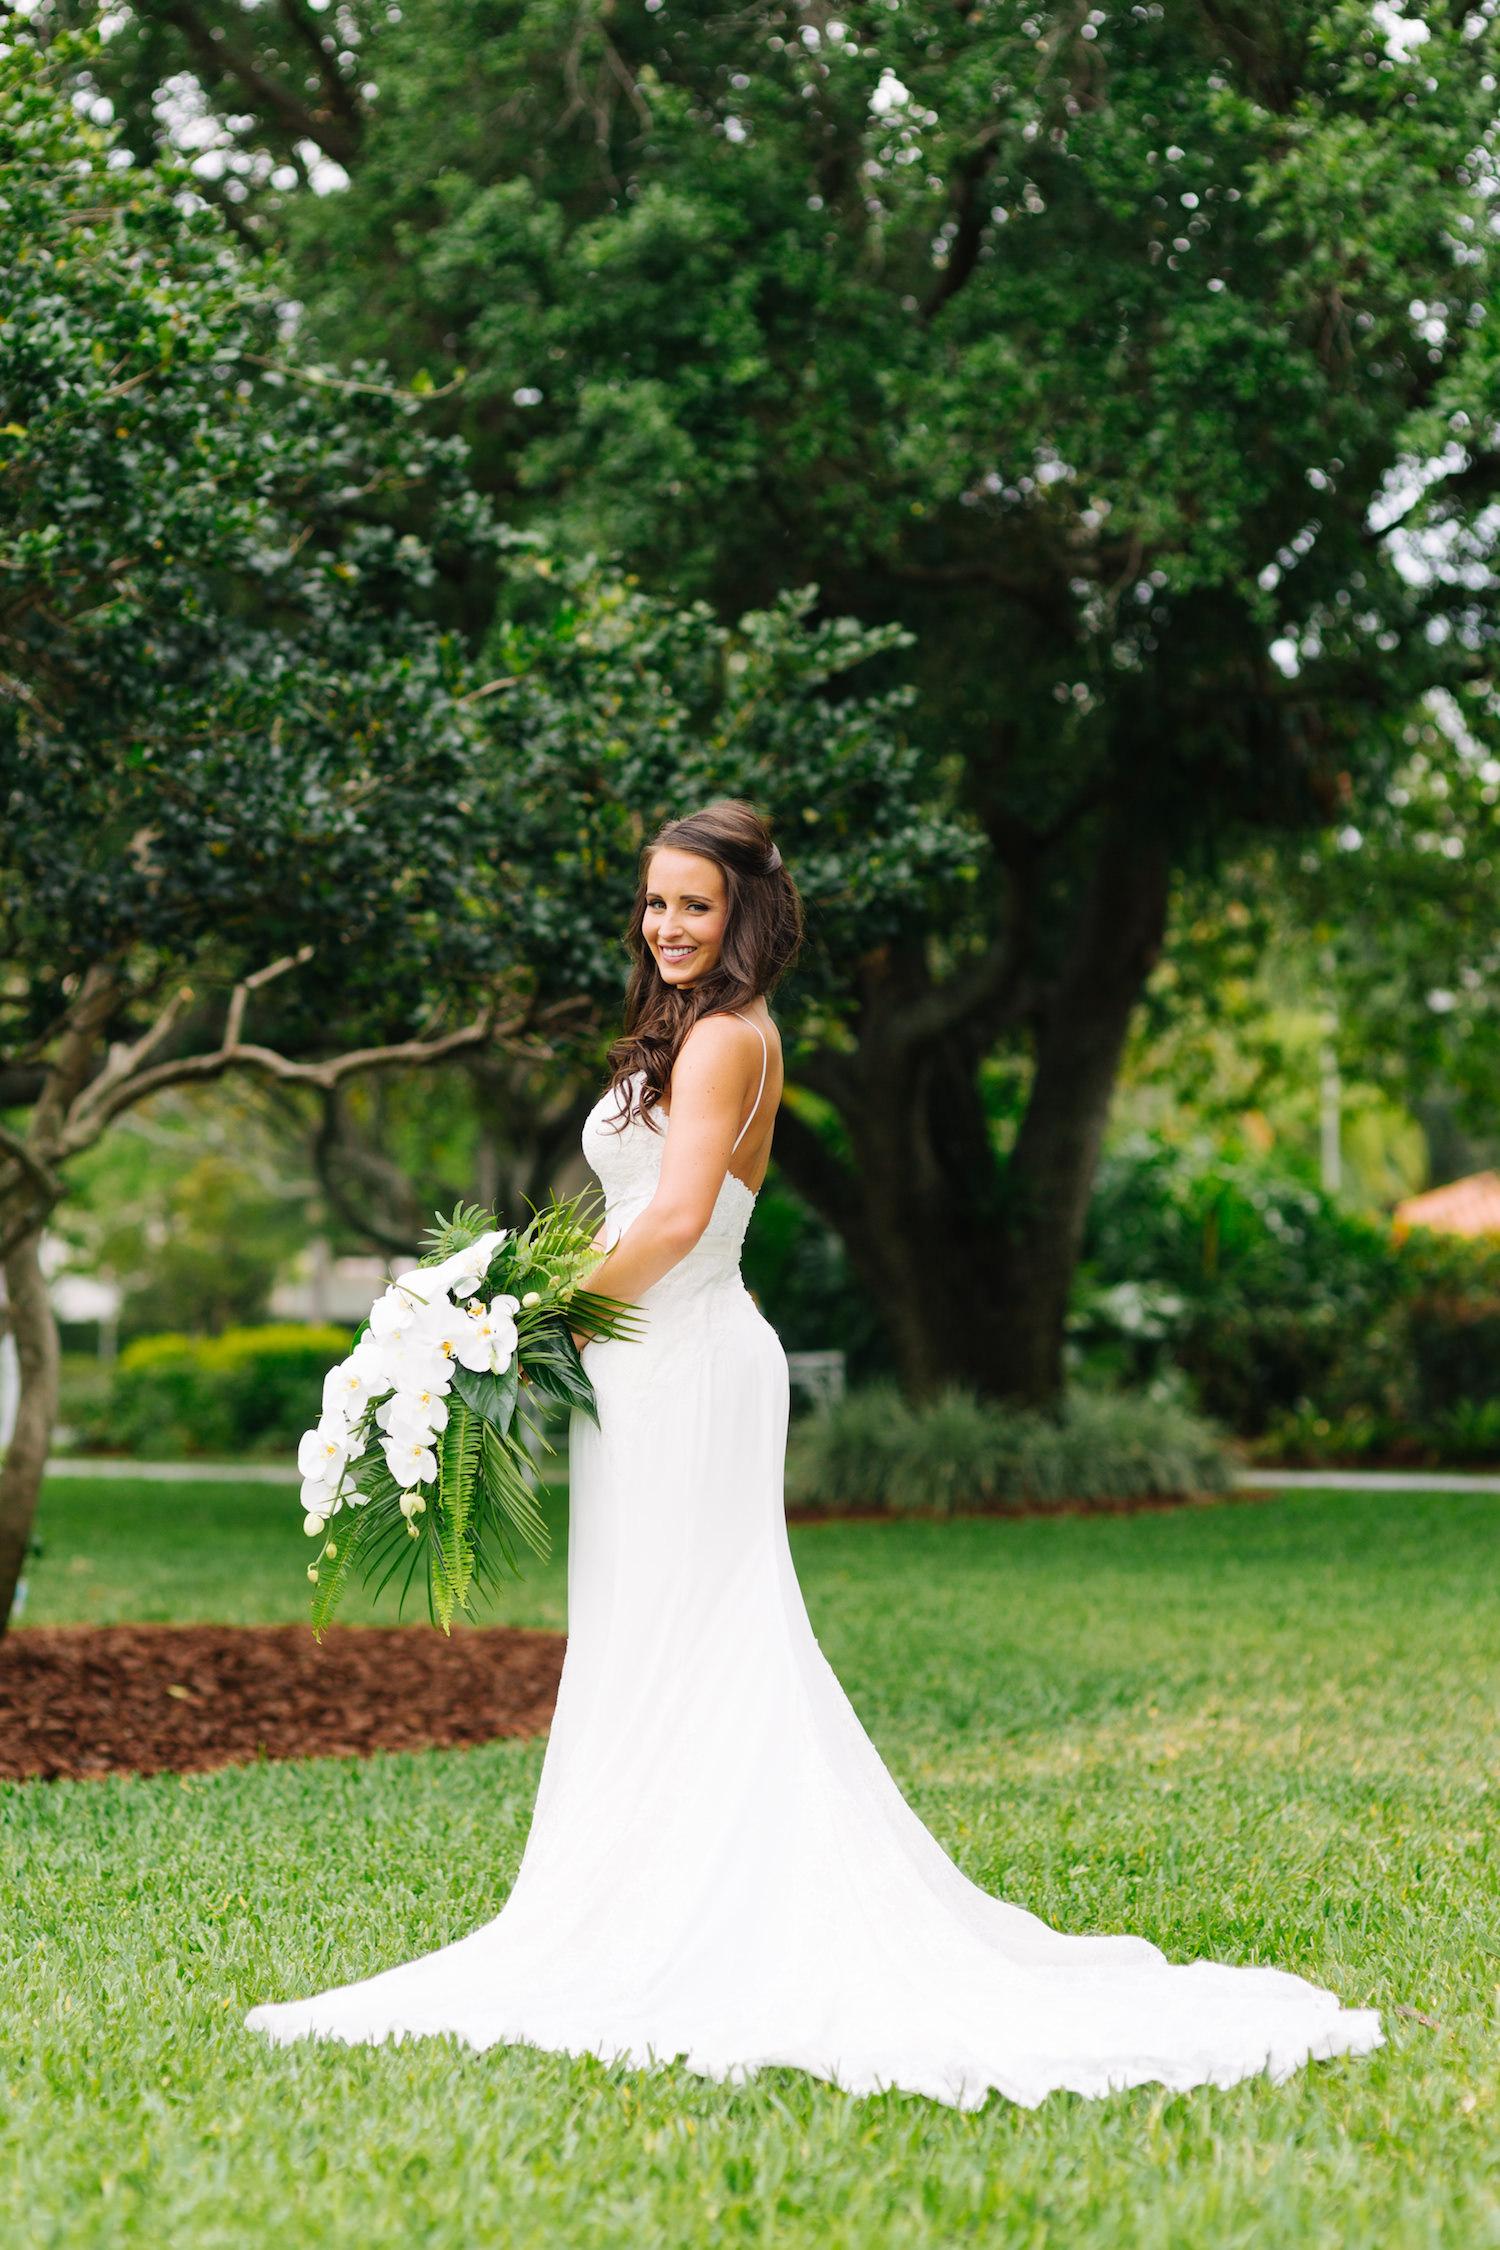 davis-islands-garden-club-wedding-portraits-jake-and-katie-photography